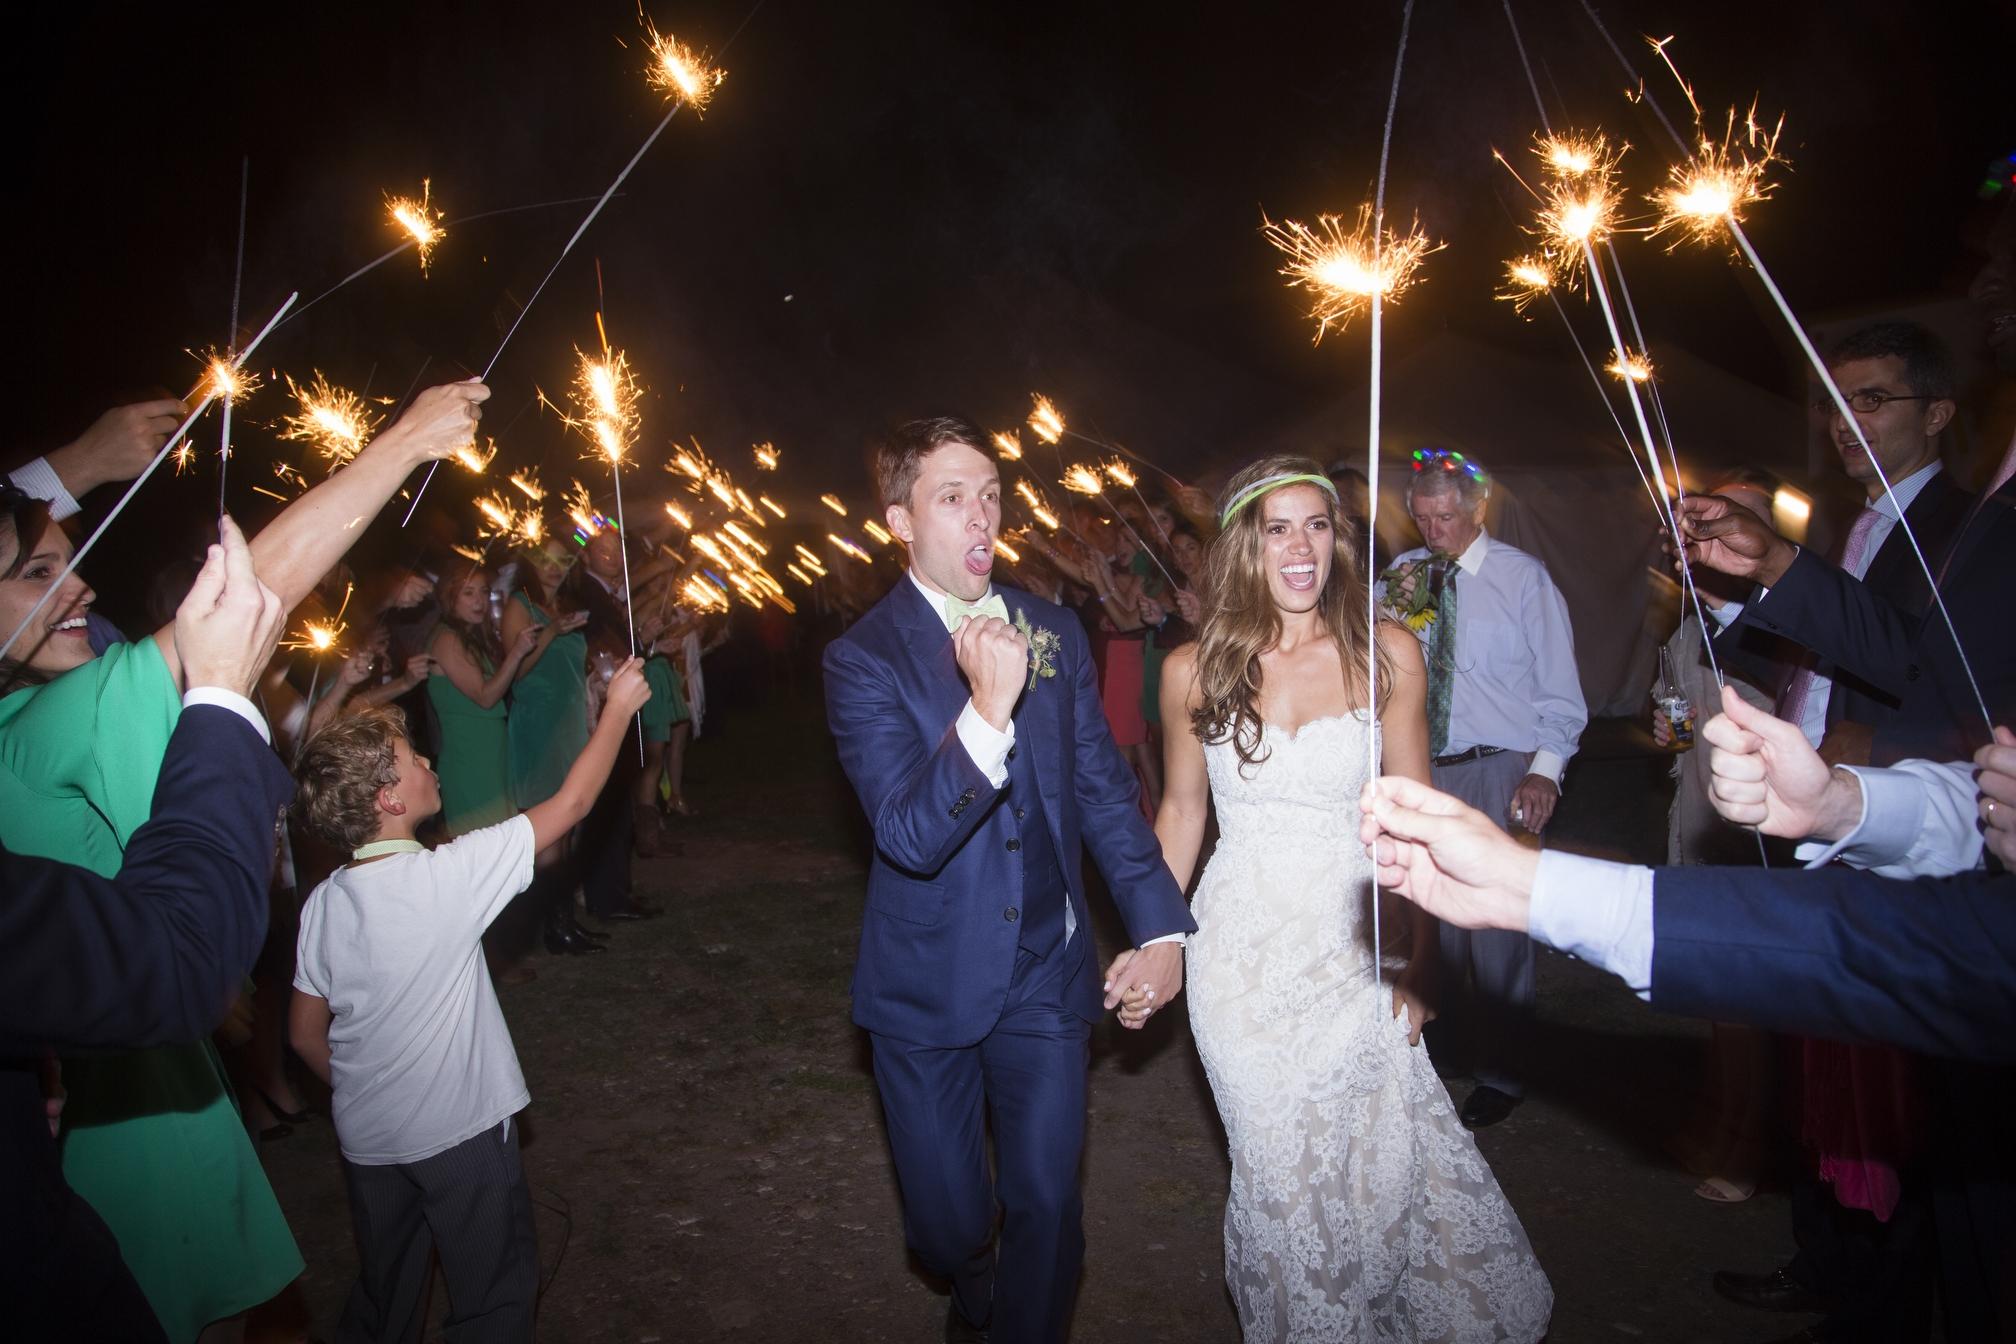 DeLarosa Wedding Jackson Hole 2104m_0490.JPG